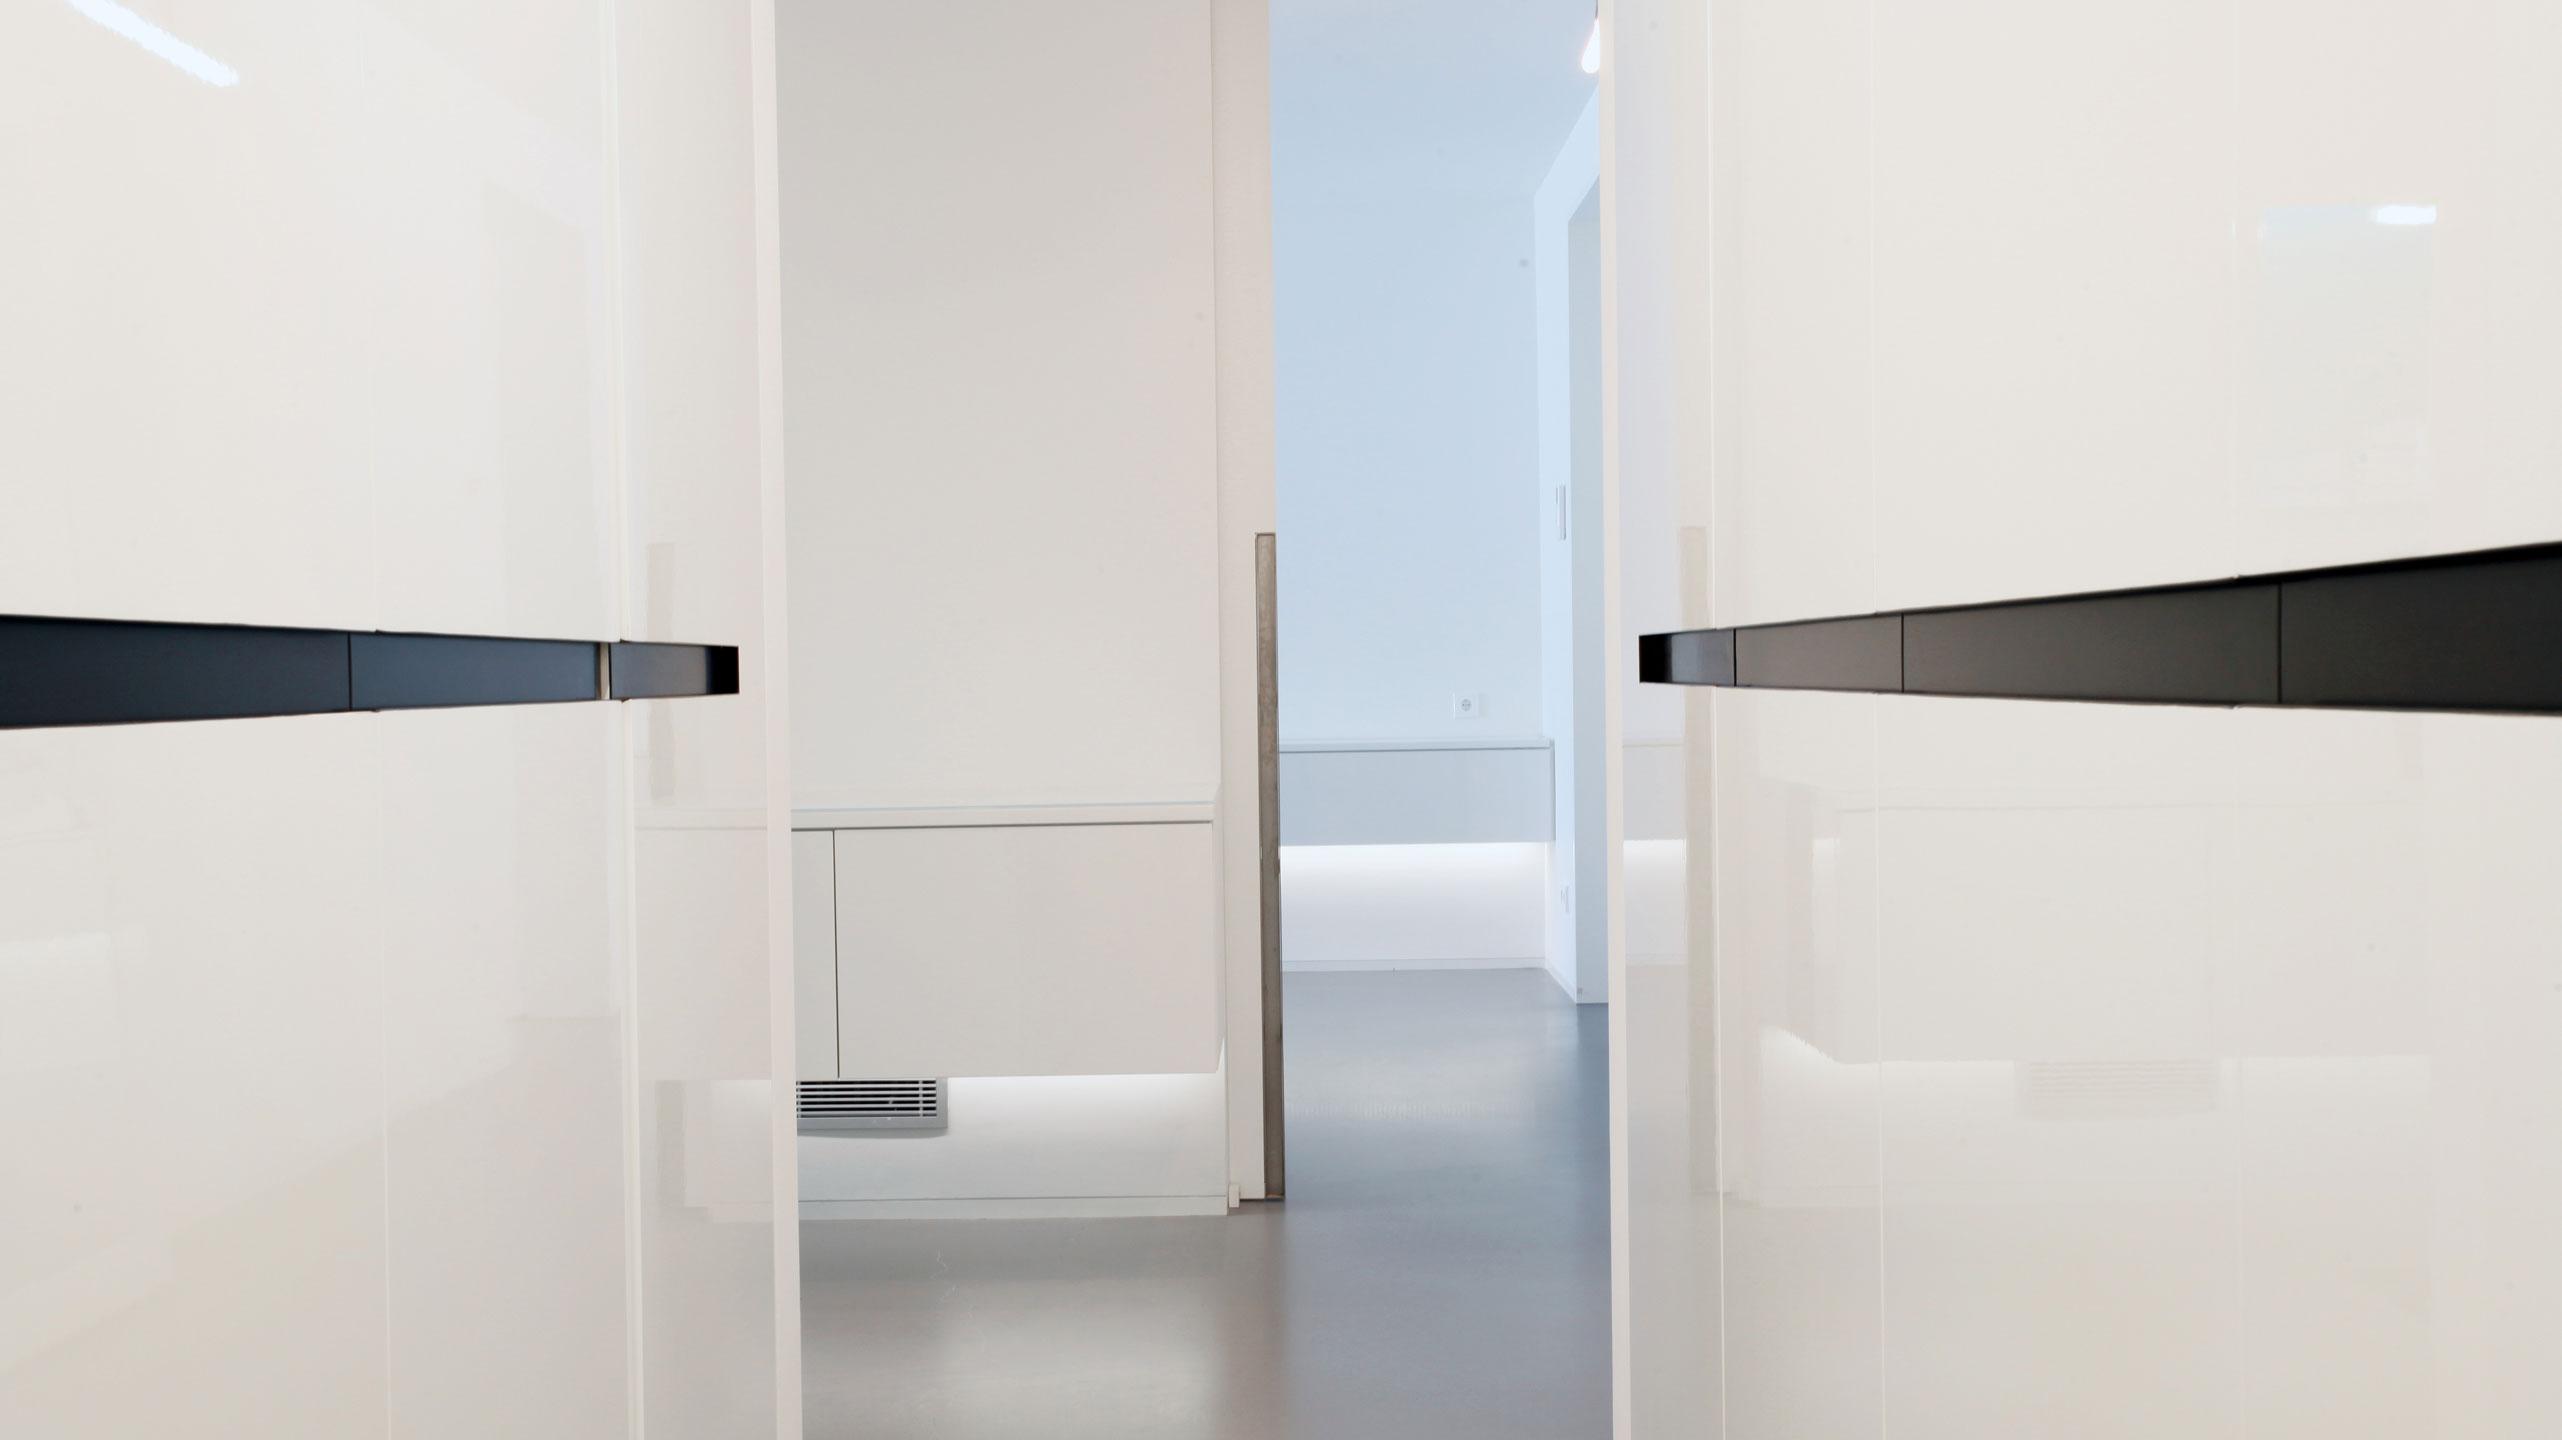 Villa spee by lab architecten on behance